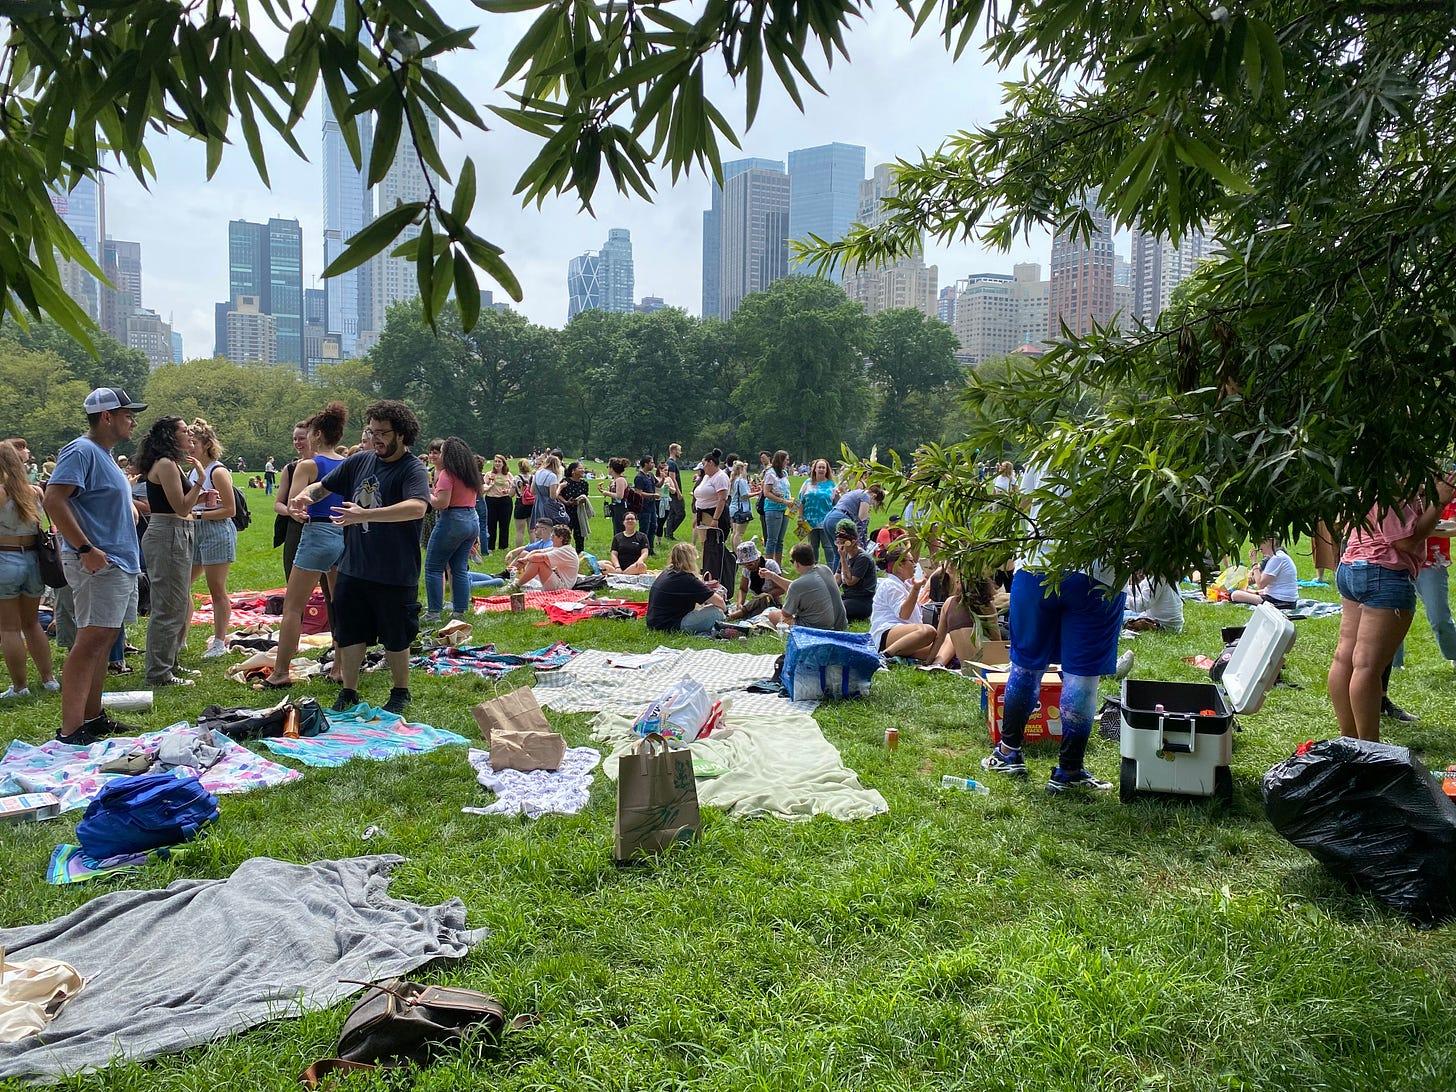 Marissa Meizz meet-up in Central Park on July 11